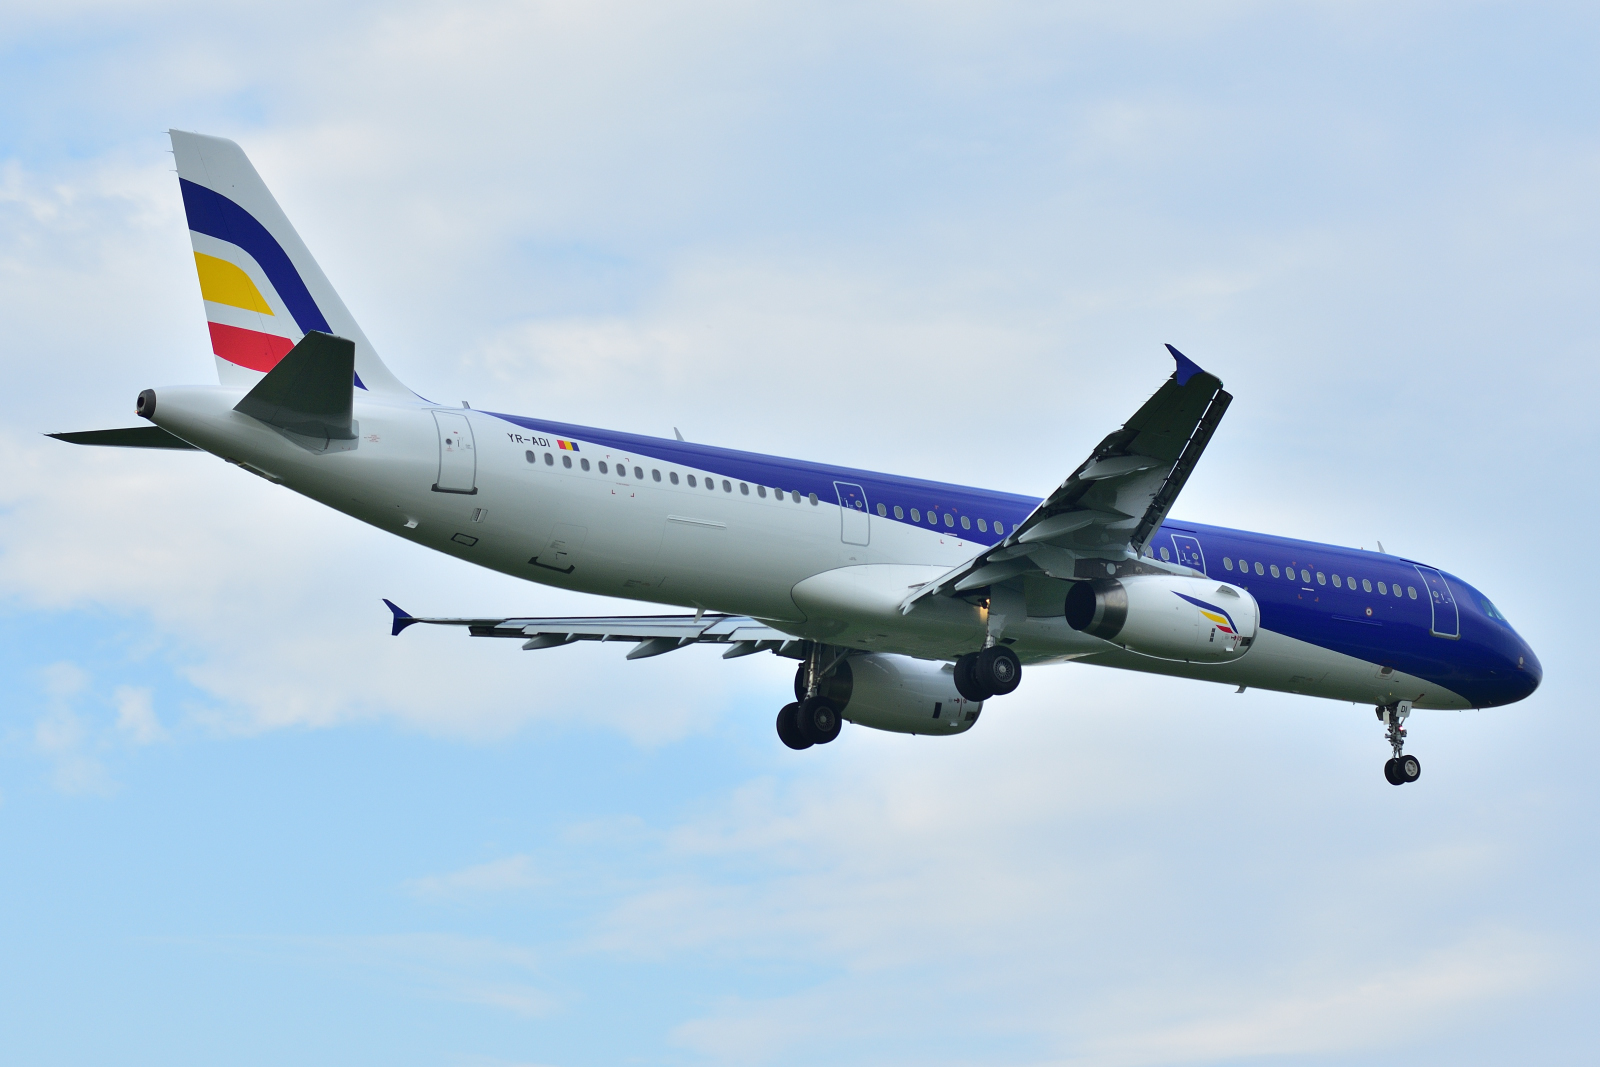 Airbus A321, YR-ADI